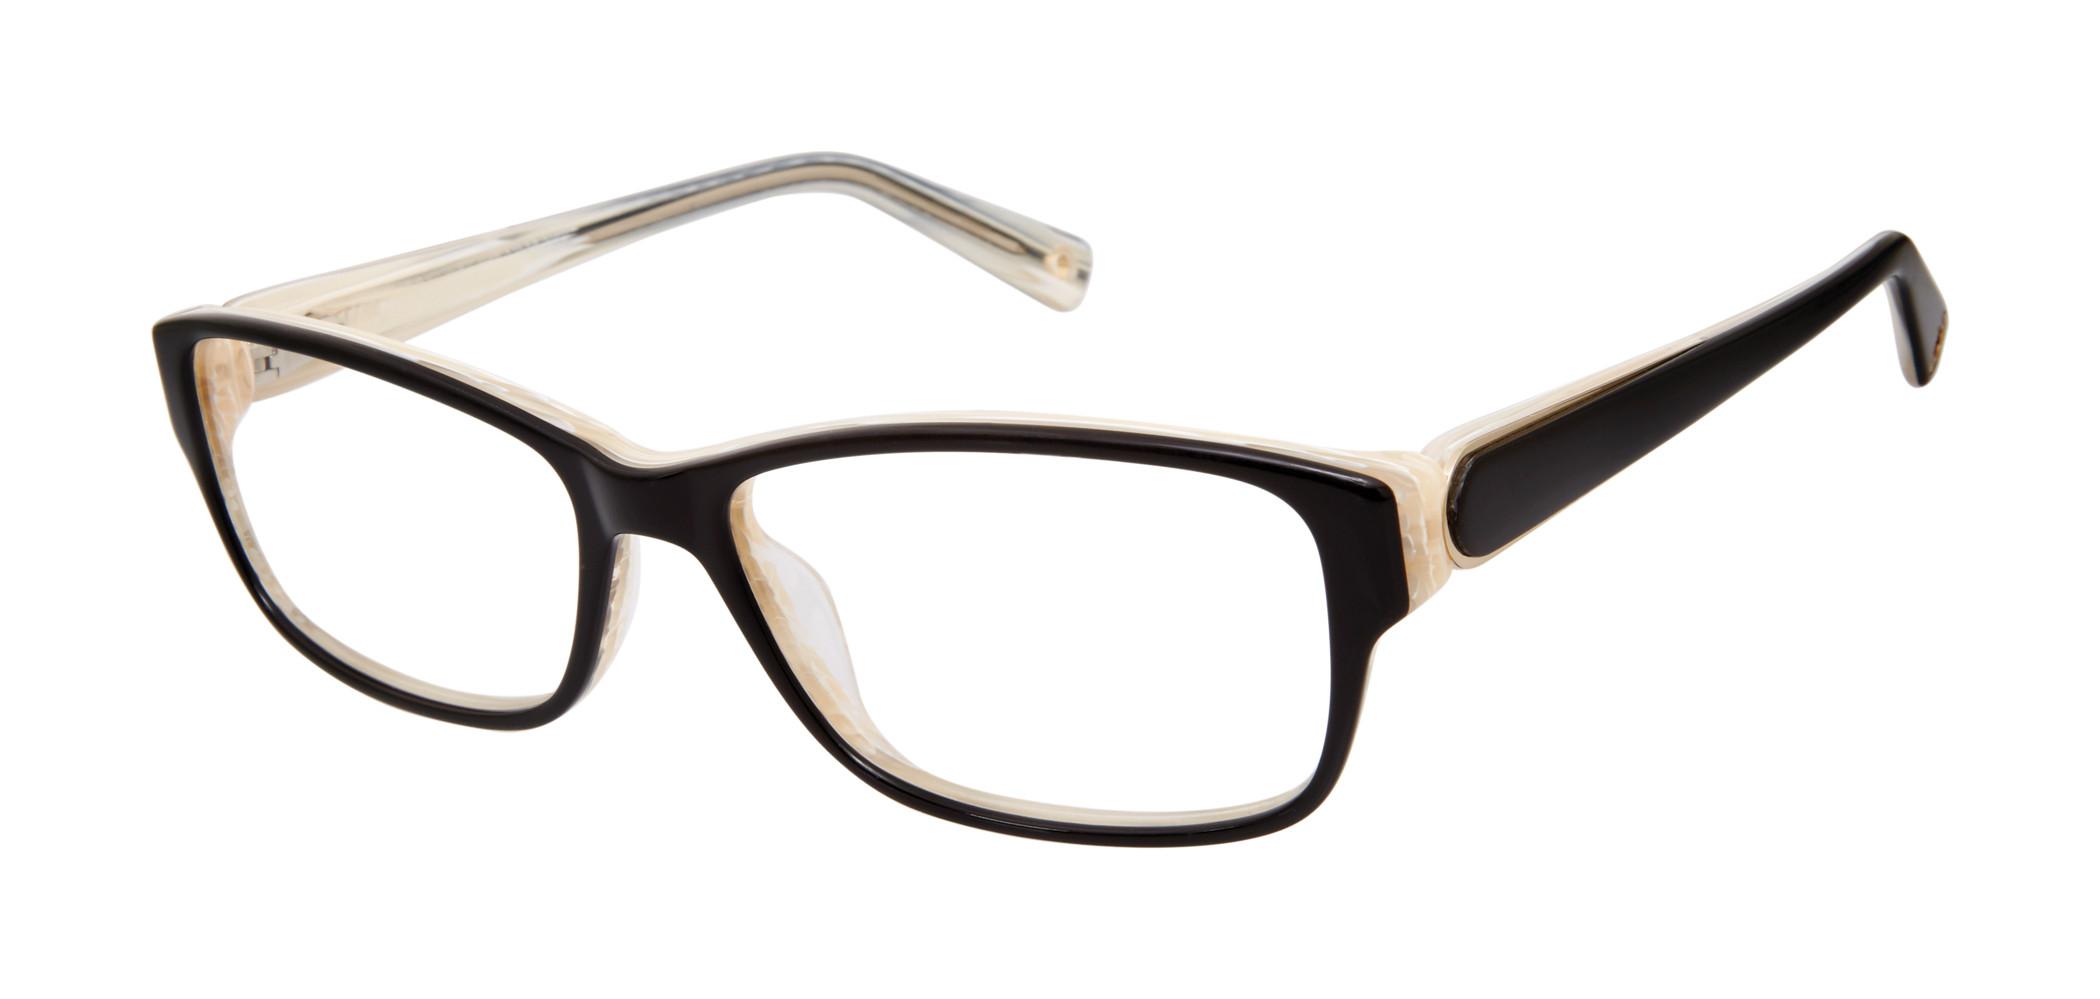 b5c5dea150 Brendel 924028 Eyeglasses - Brendel Authorized Retailer - coolframes ...